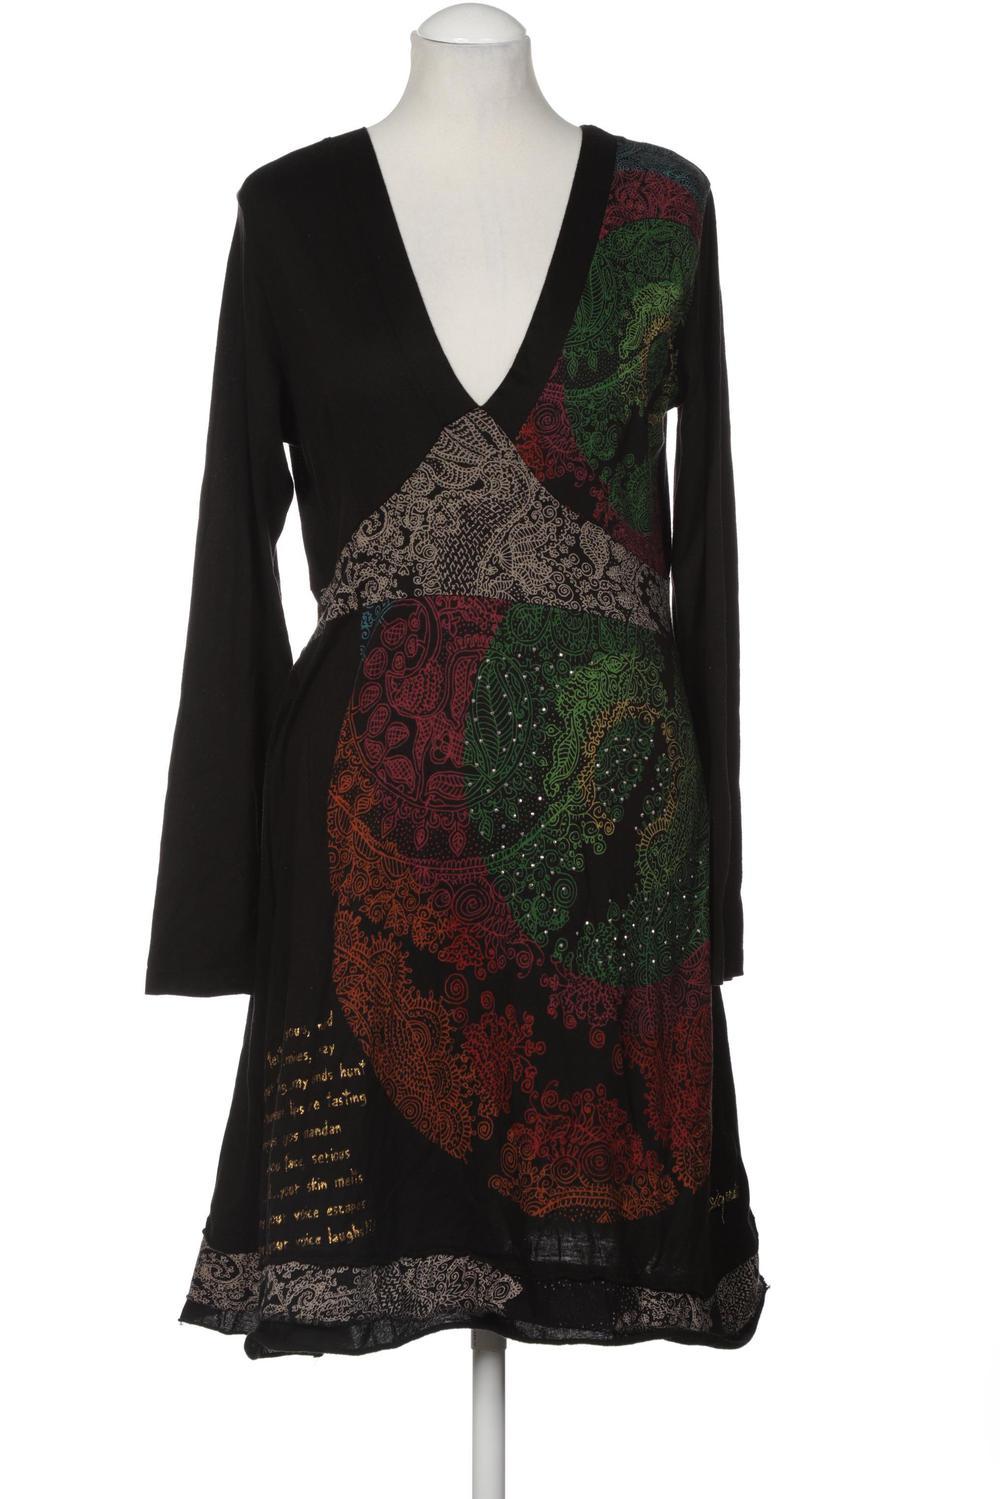 Desigual Kleid Damen Dress Damenkleid Gr. XL Baumwolle ...